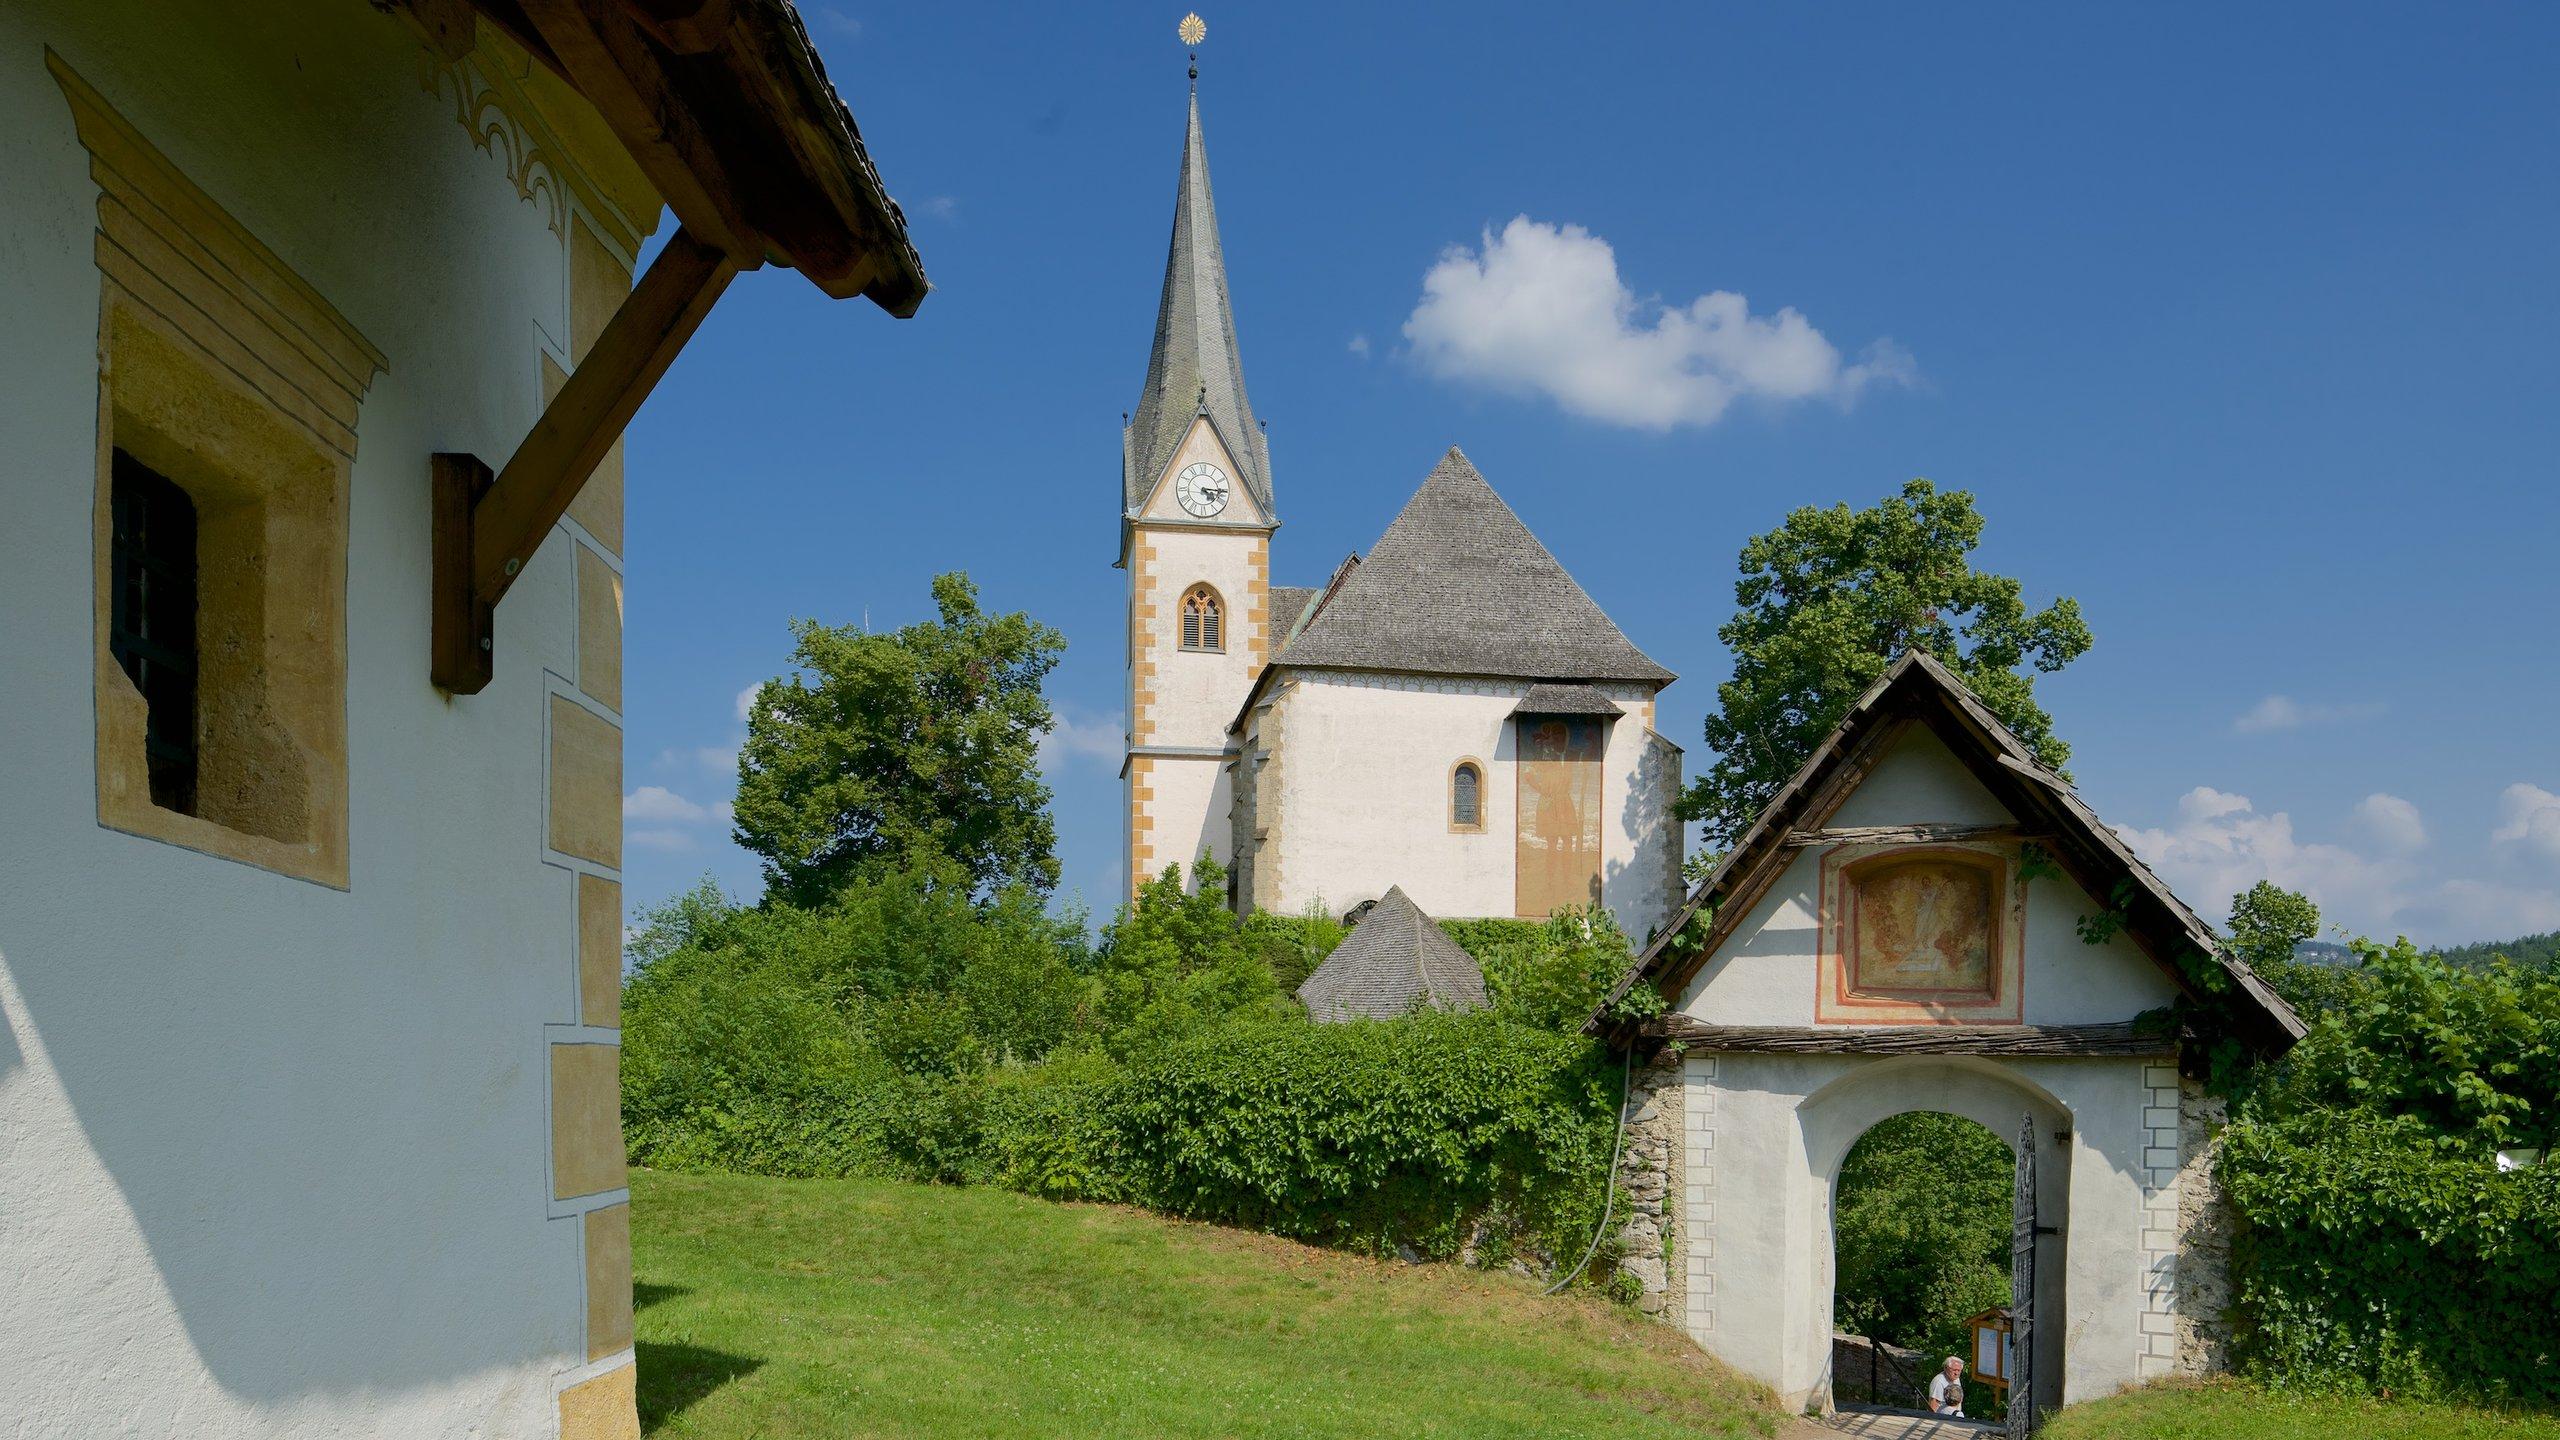 Feldkirchen District, Carinthia, Austria